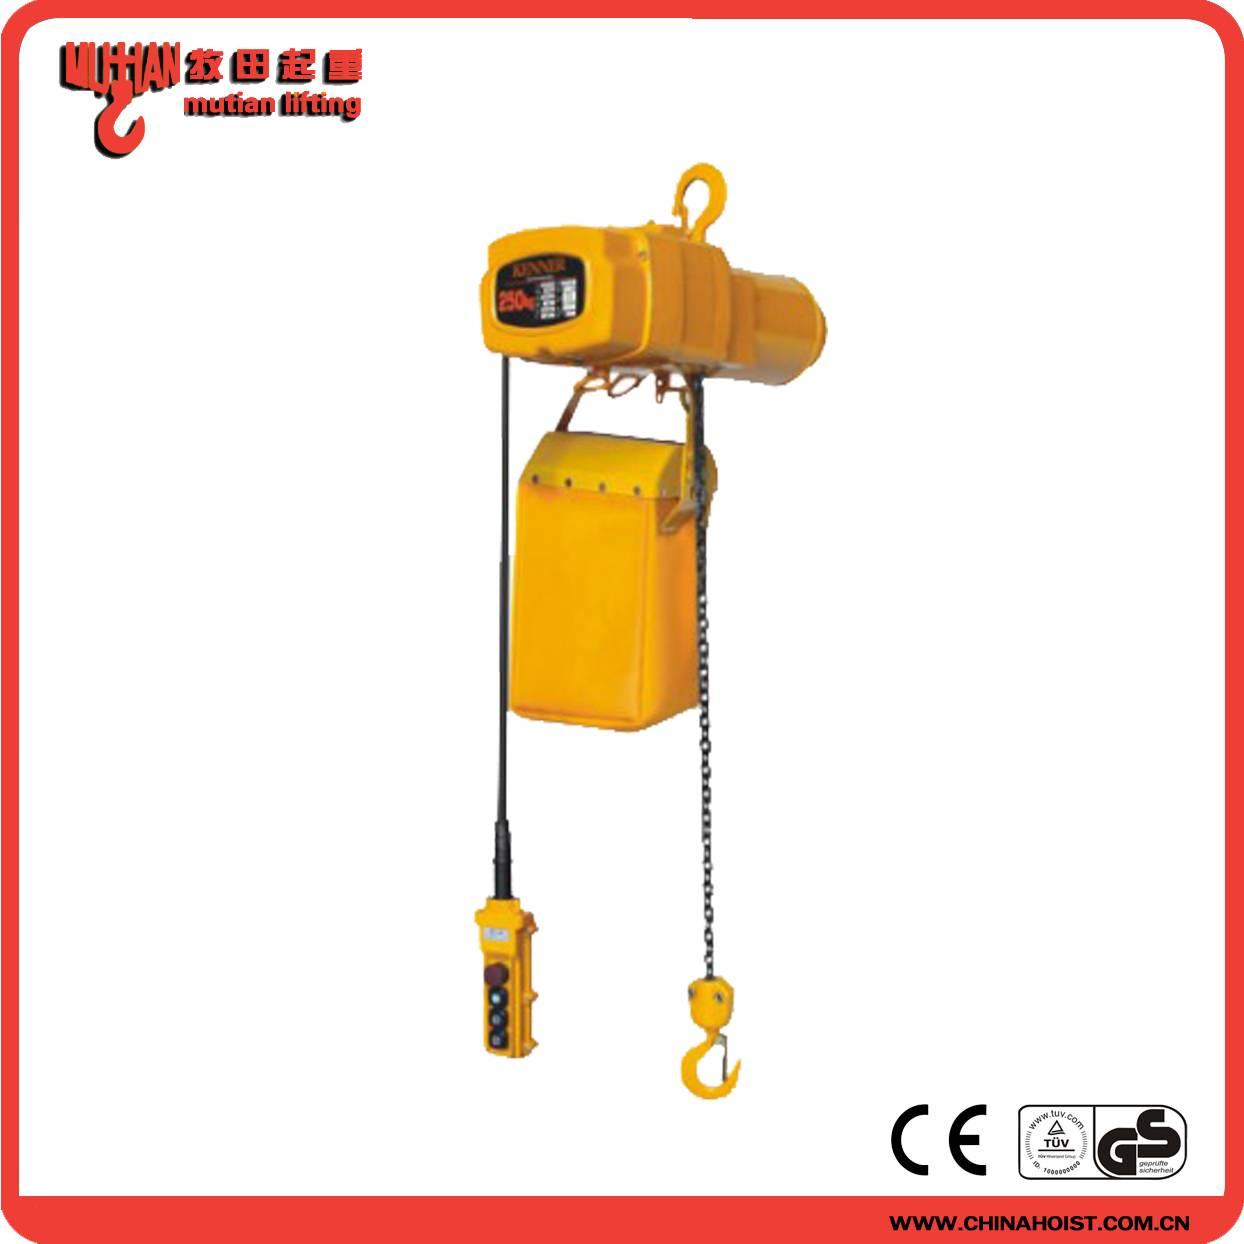 HHSY 250kg Electric Chain Hoist Dubai with remote control